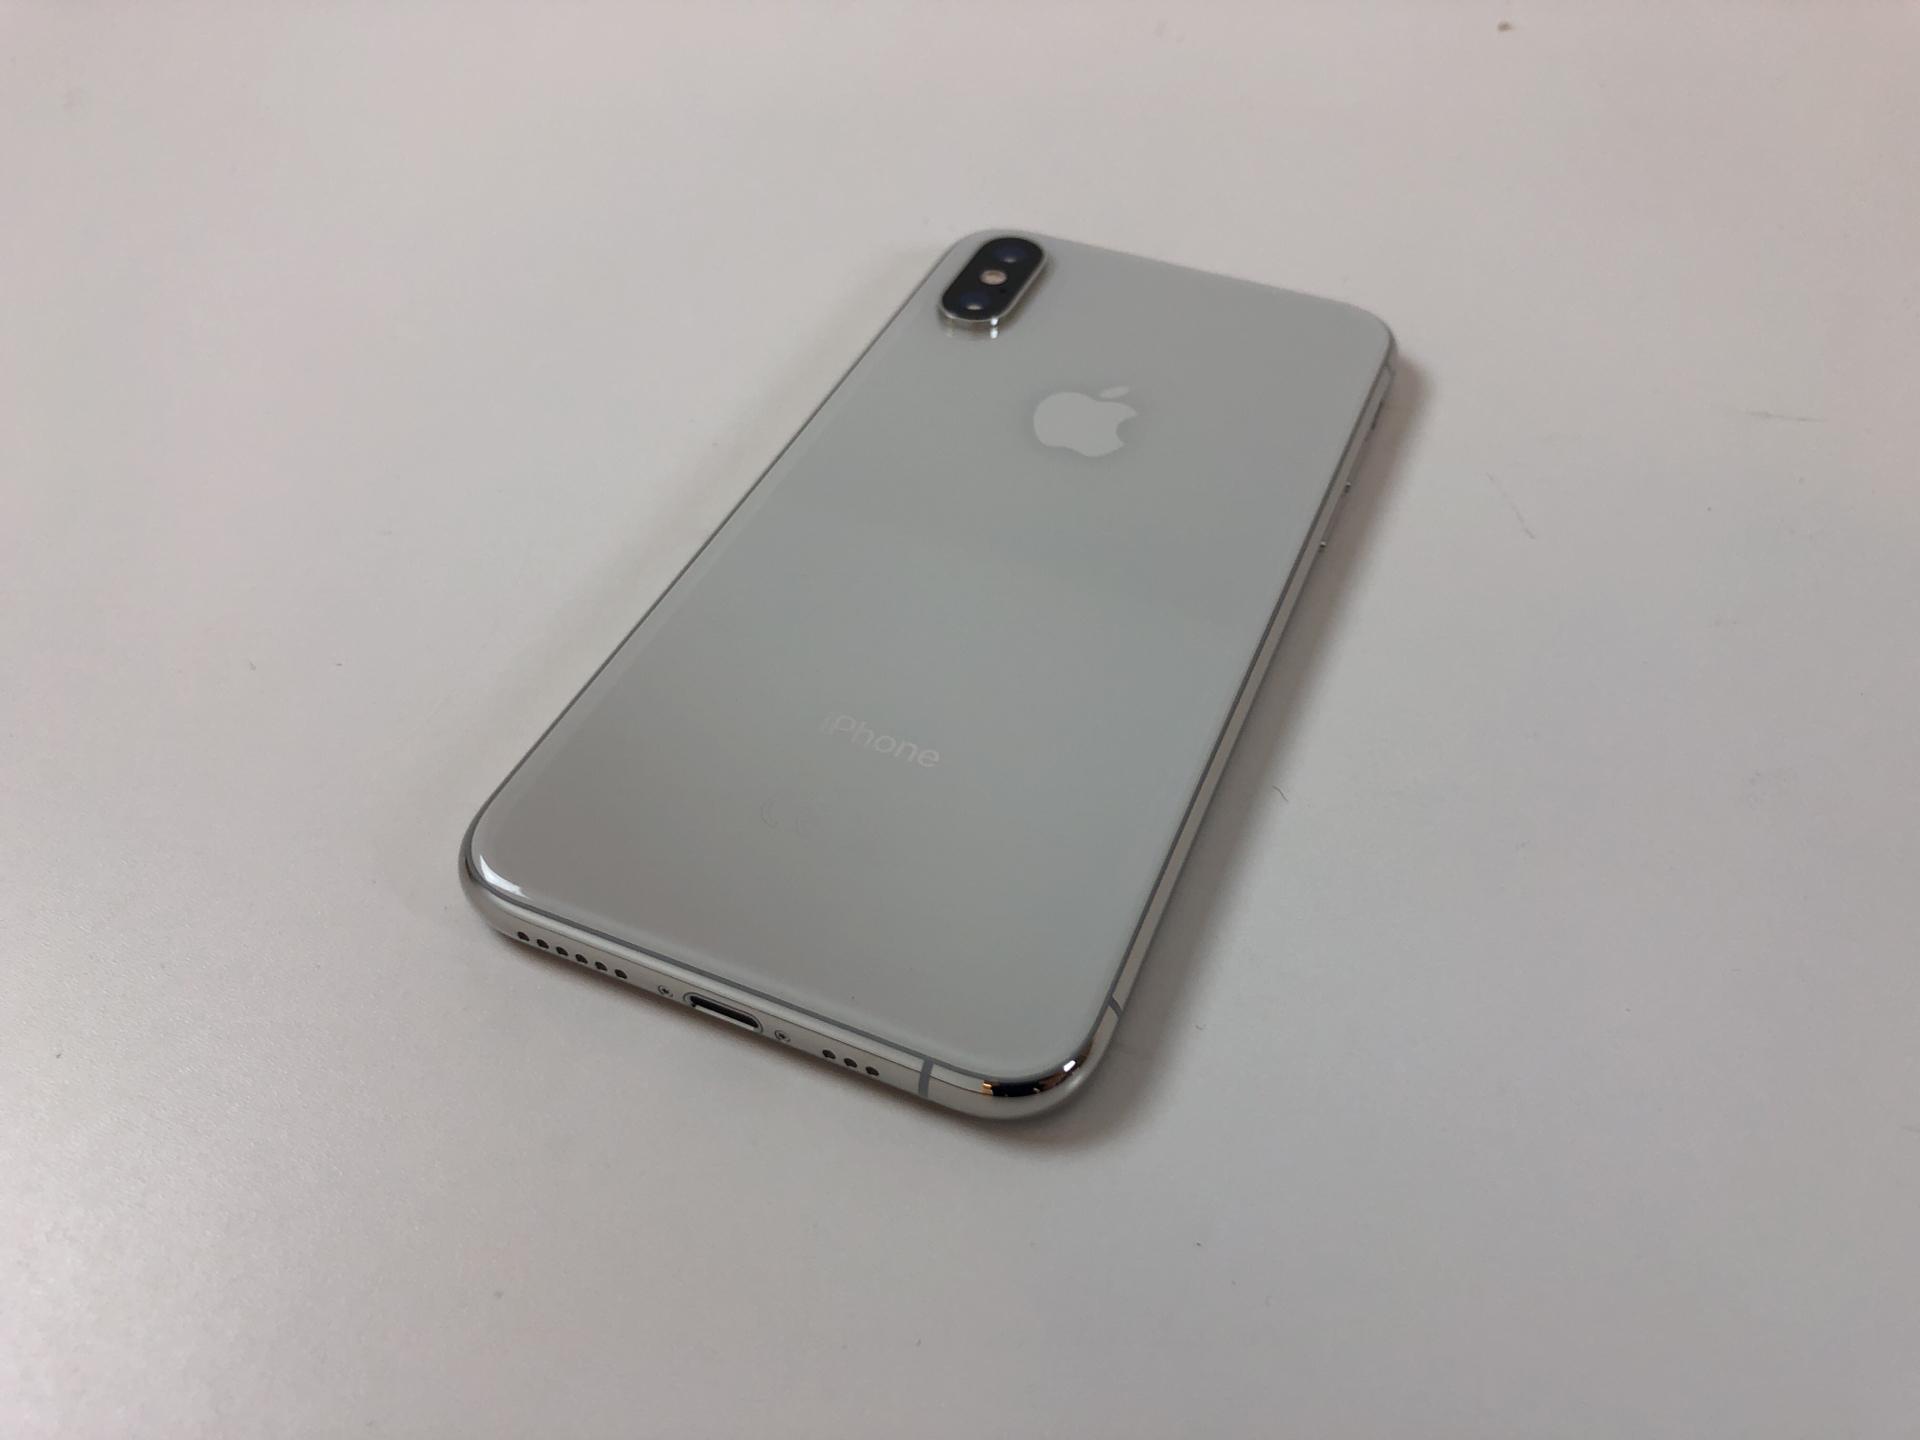 iPhone XS 256GB, 256GB, Silver, bild 3